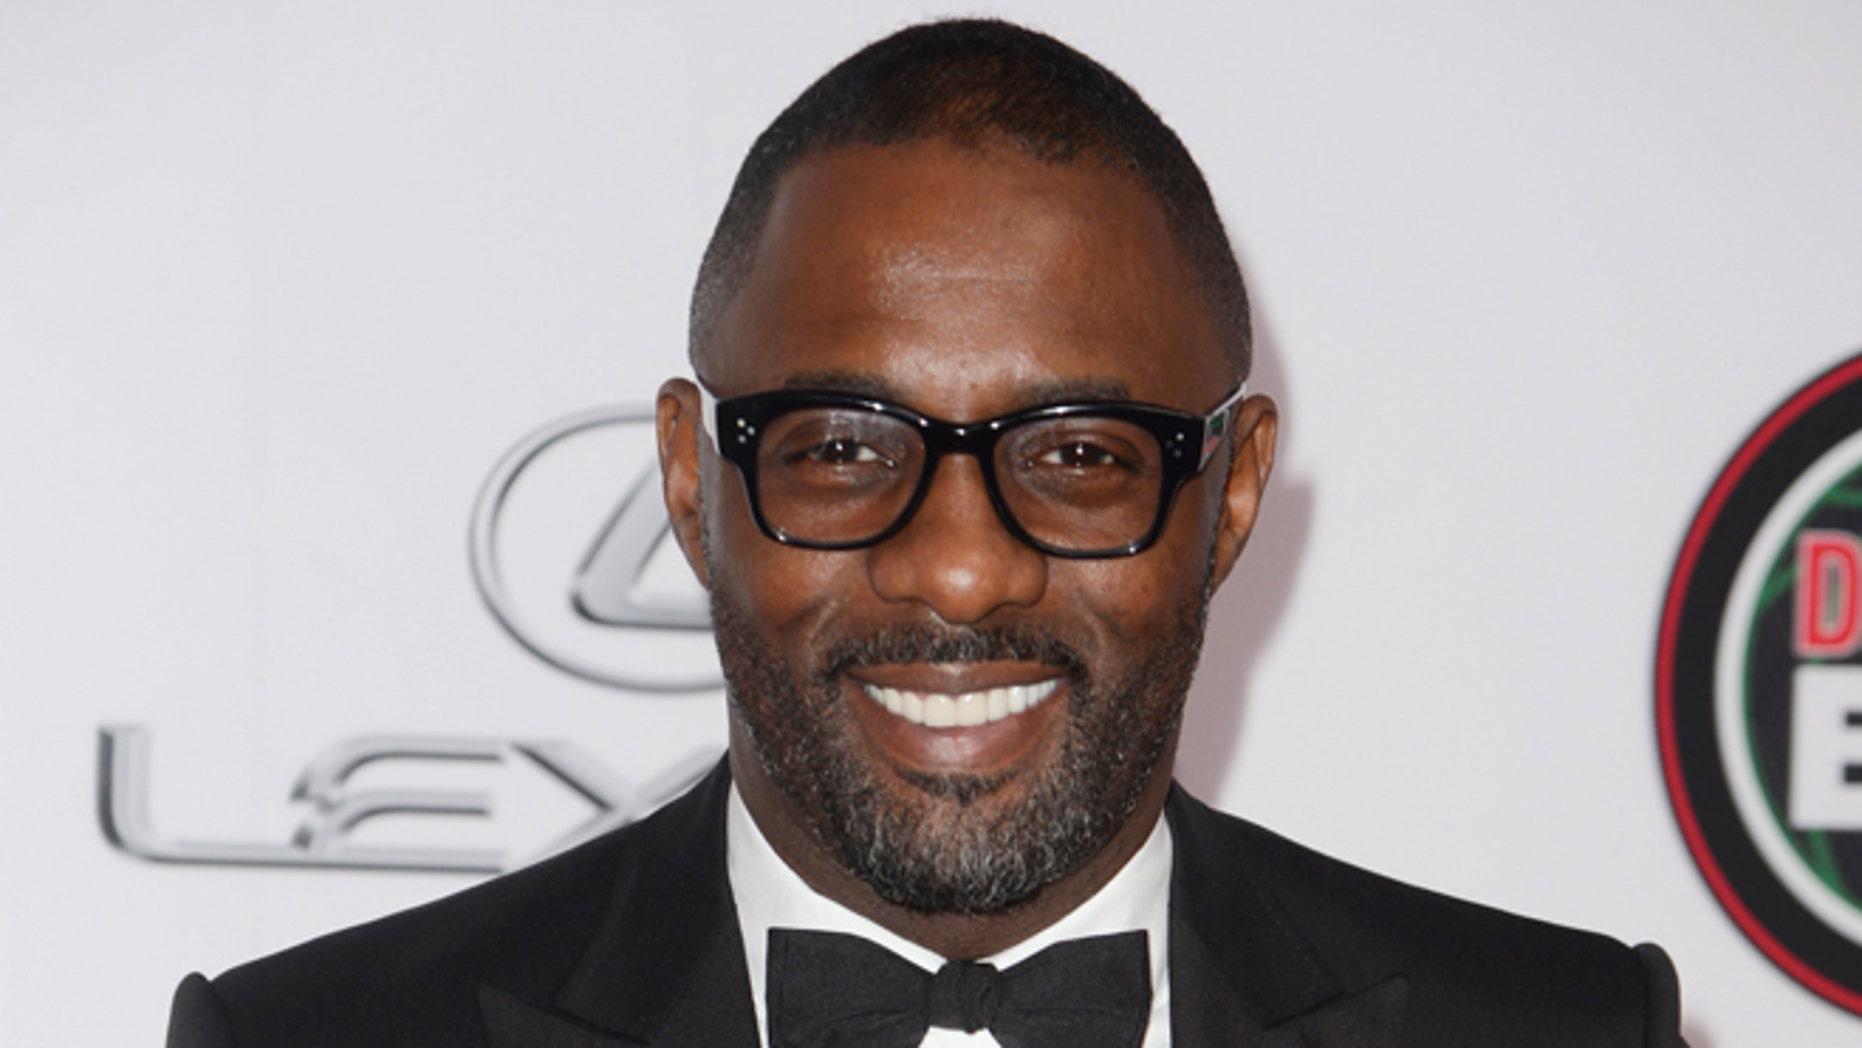 February 22, 2014. Idris Elba attends the 45th NAACP Image Awards in Pasadena, California.